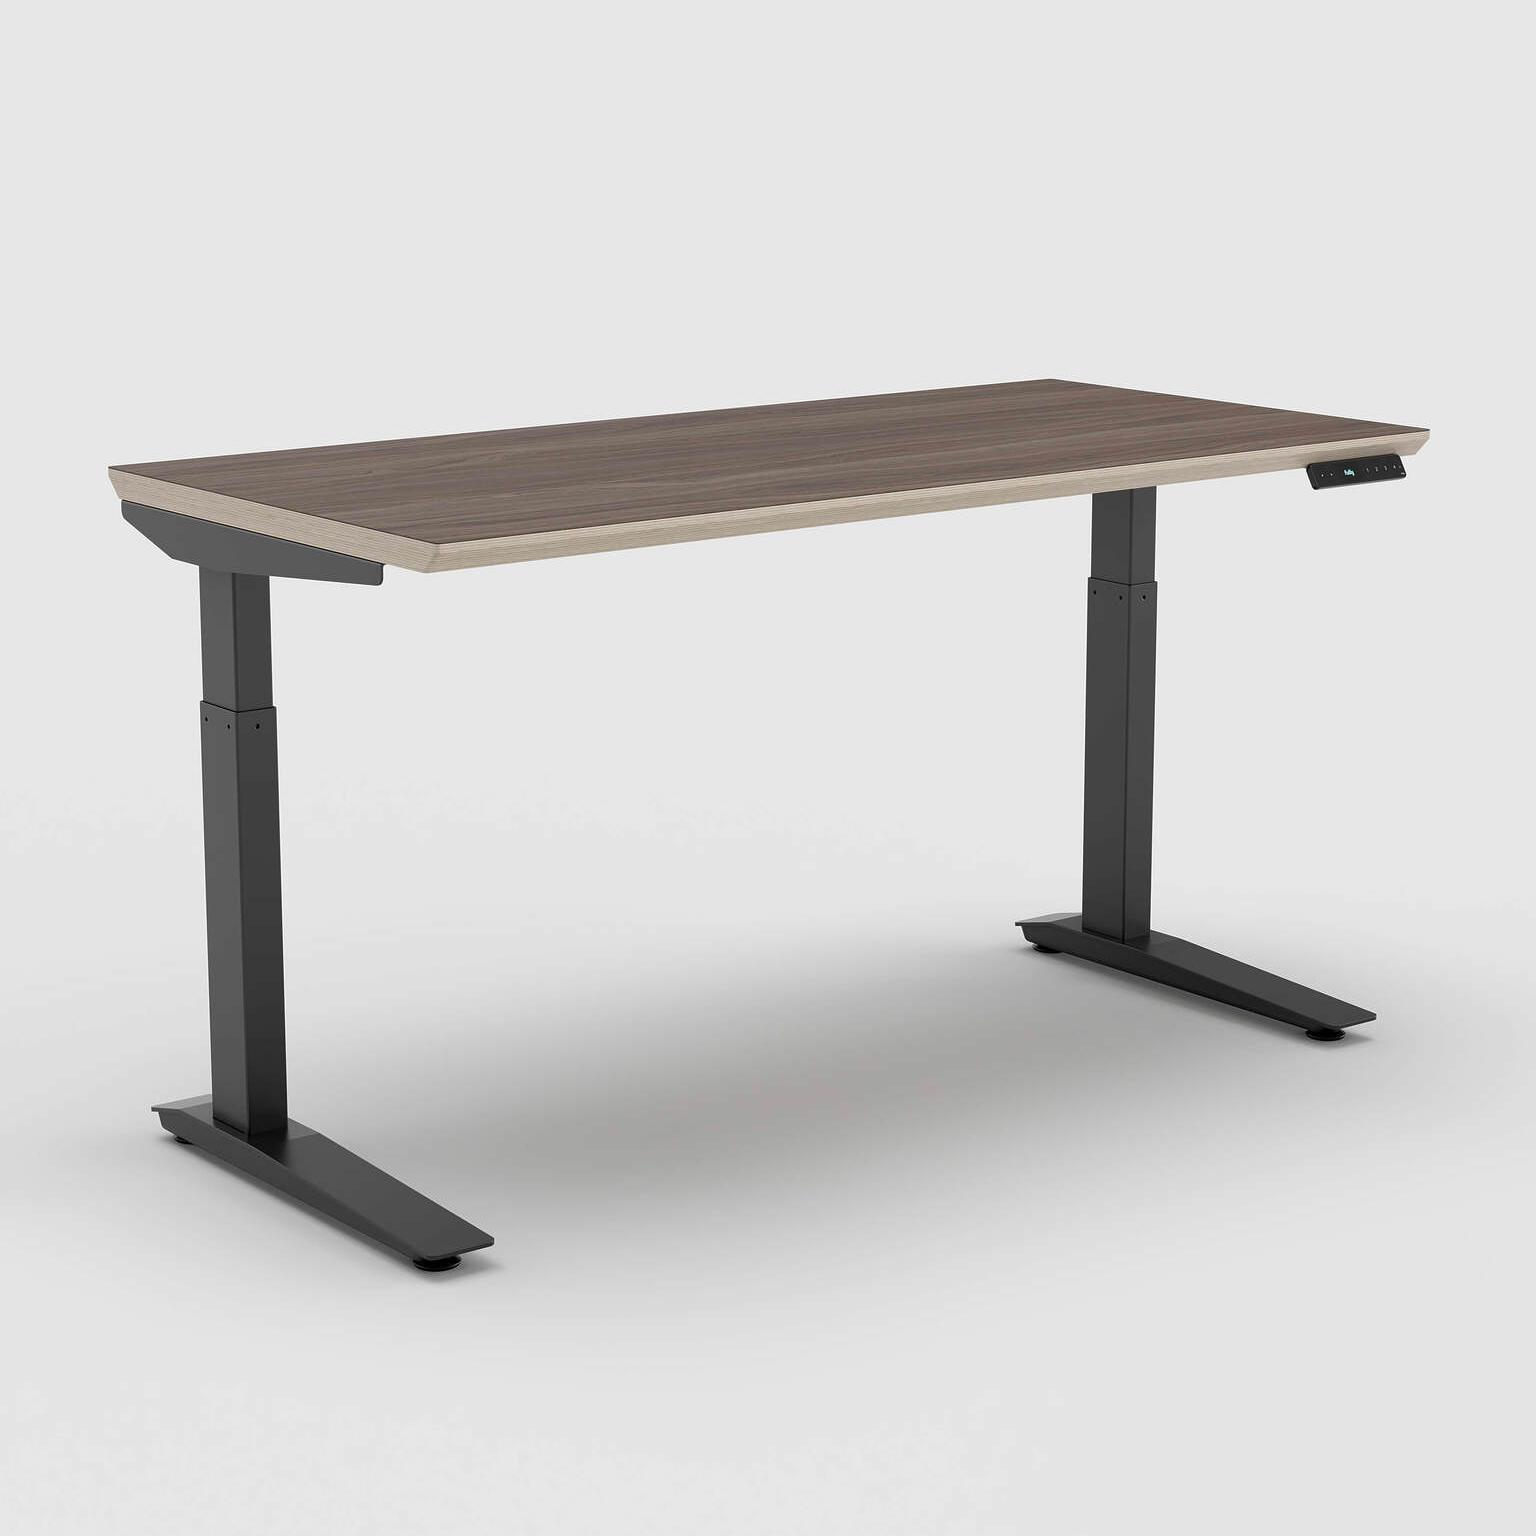 floyd standing desk reviews